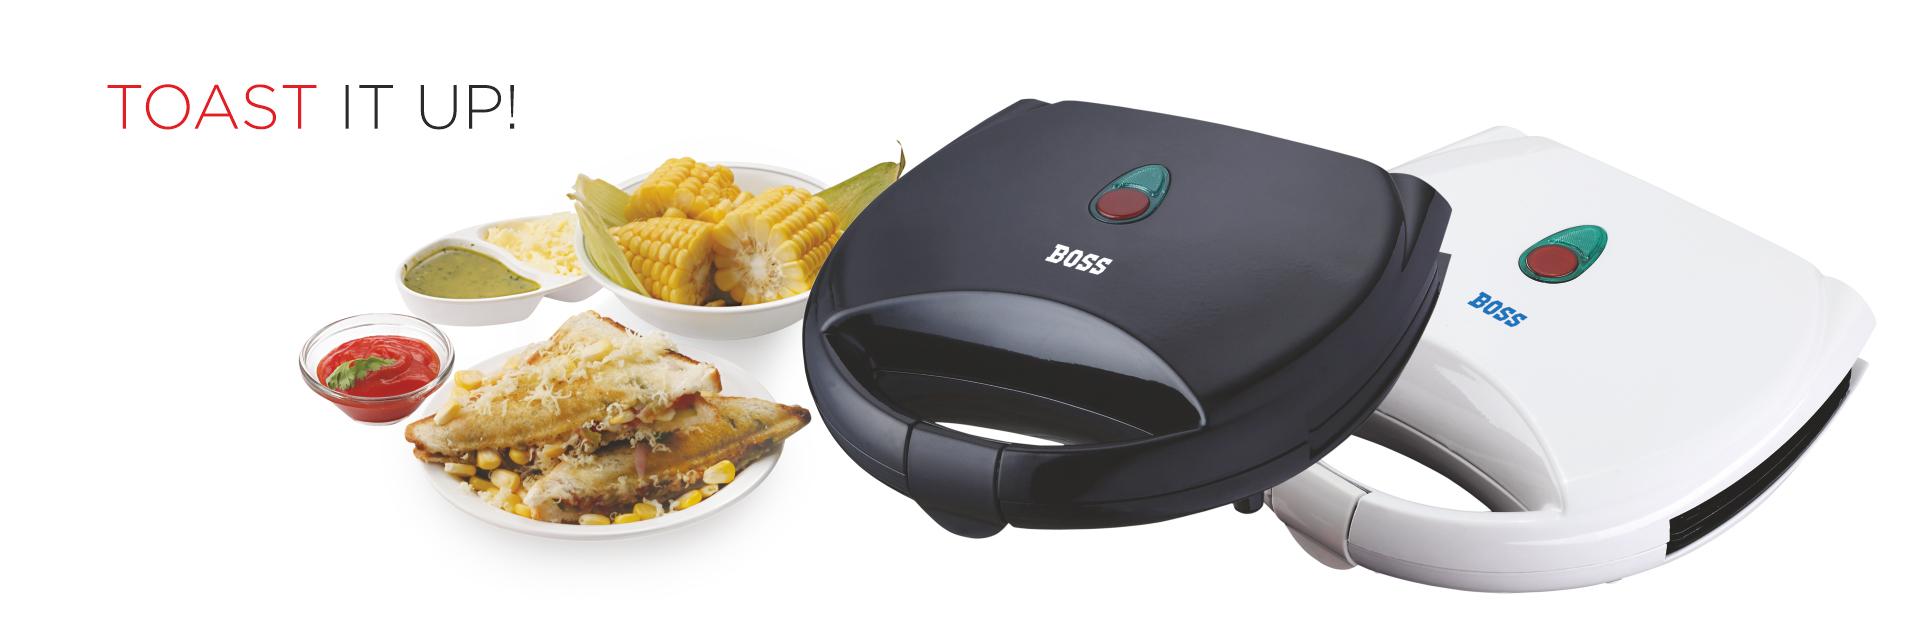 BOSS Griller Toaster